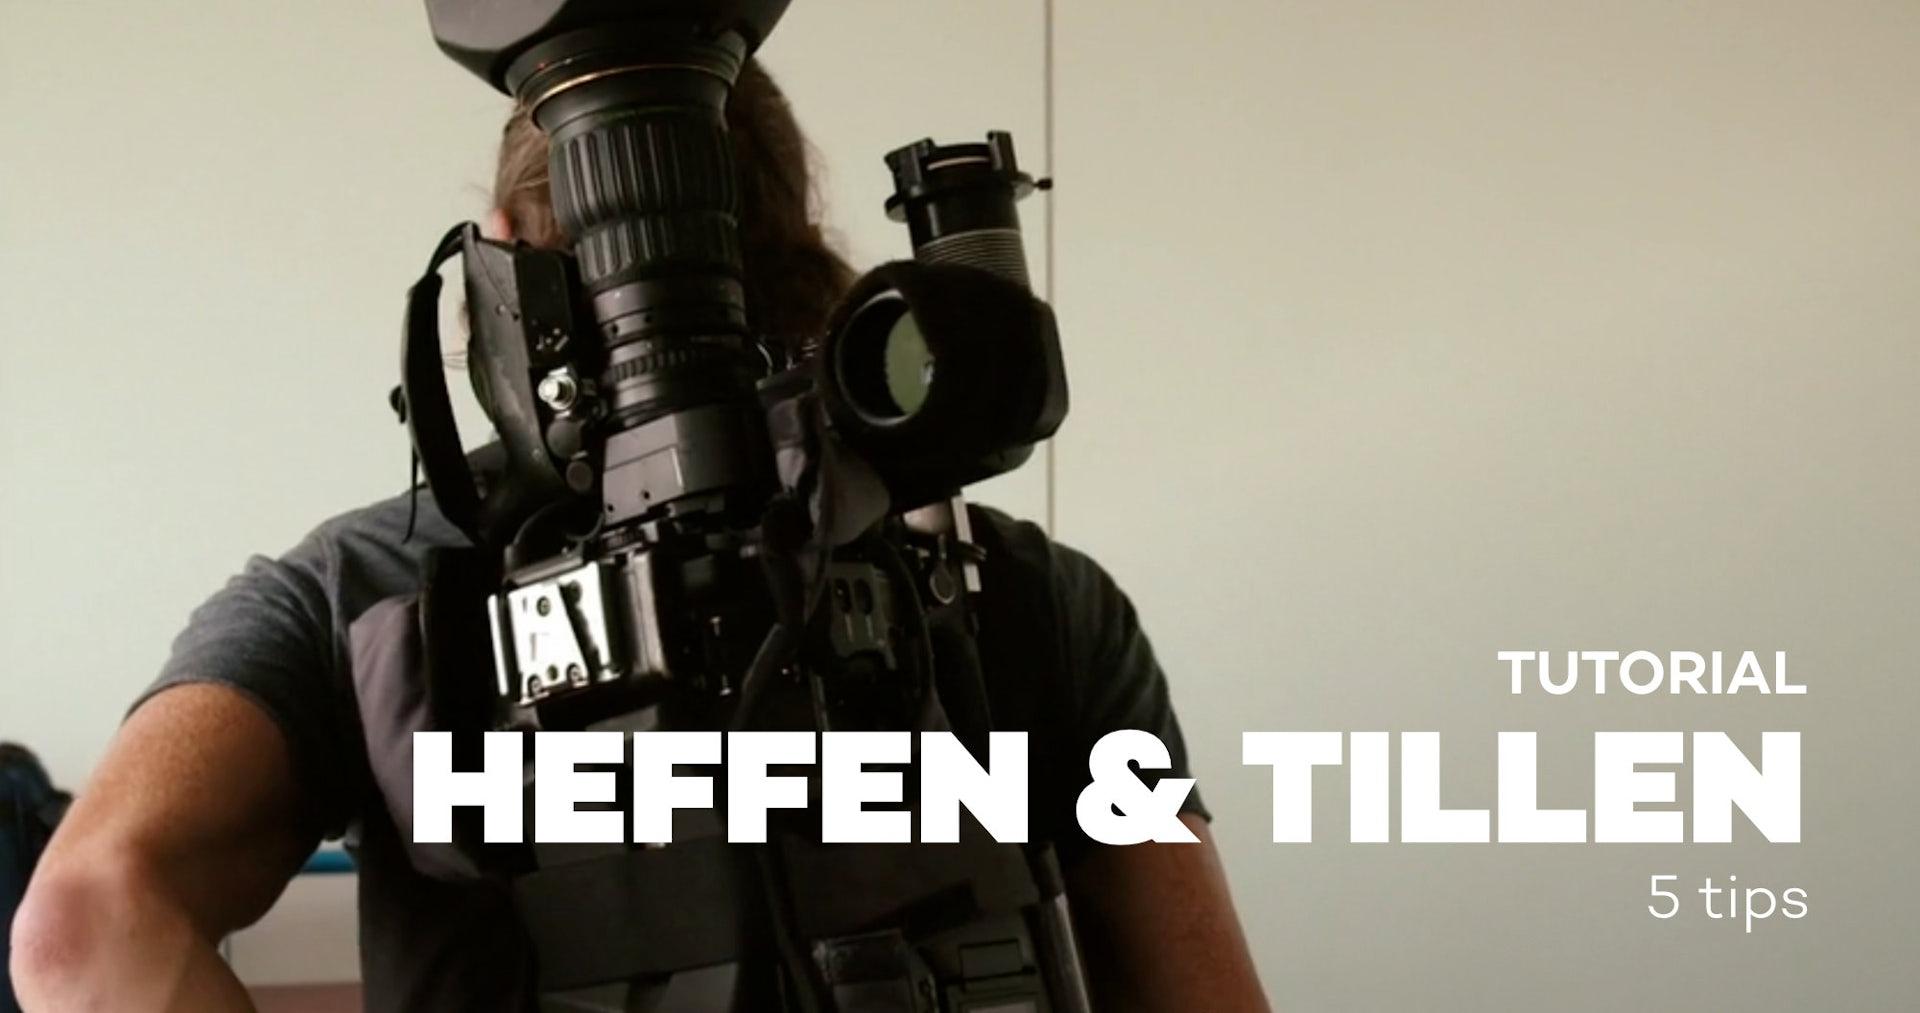 5 safety tips van cameraman Sébastien Dubois